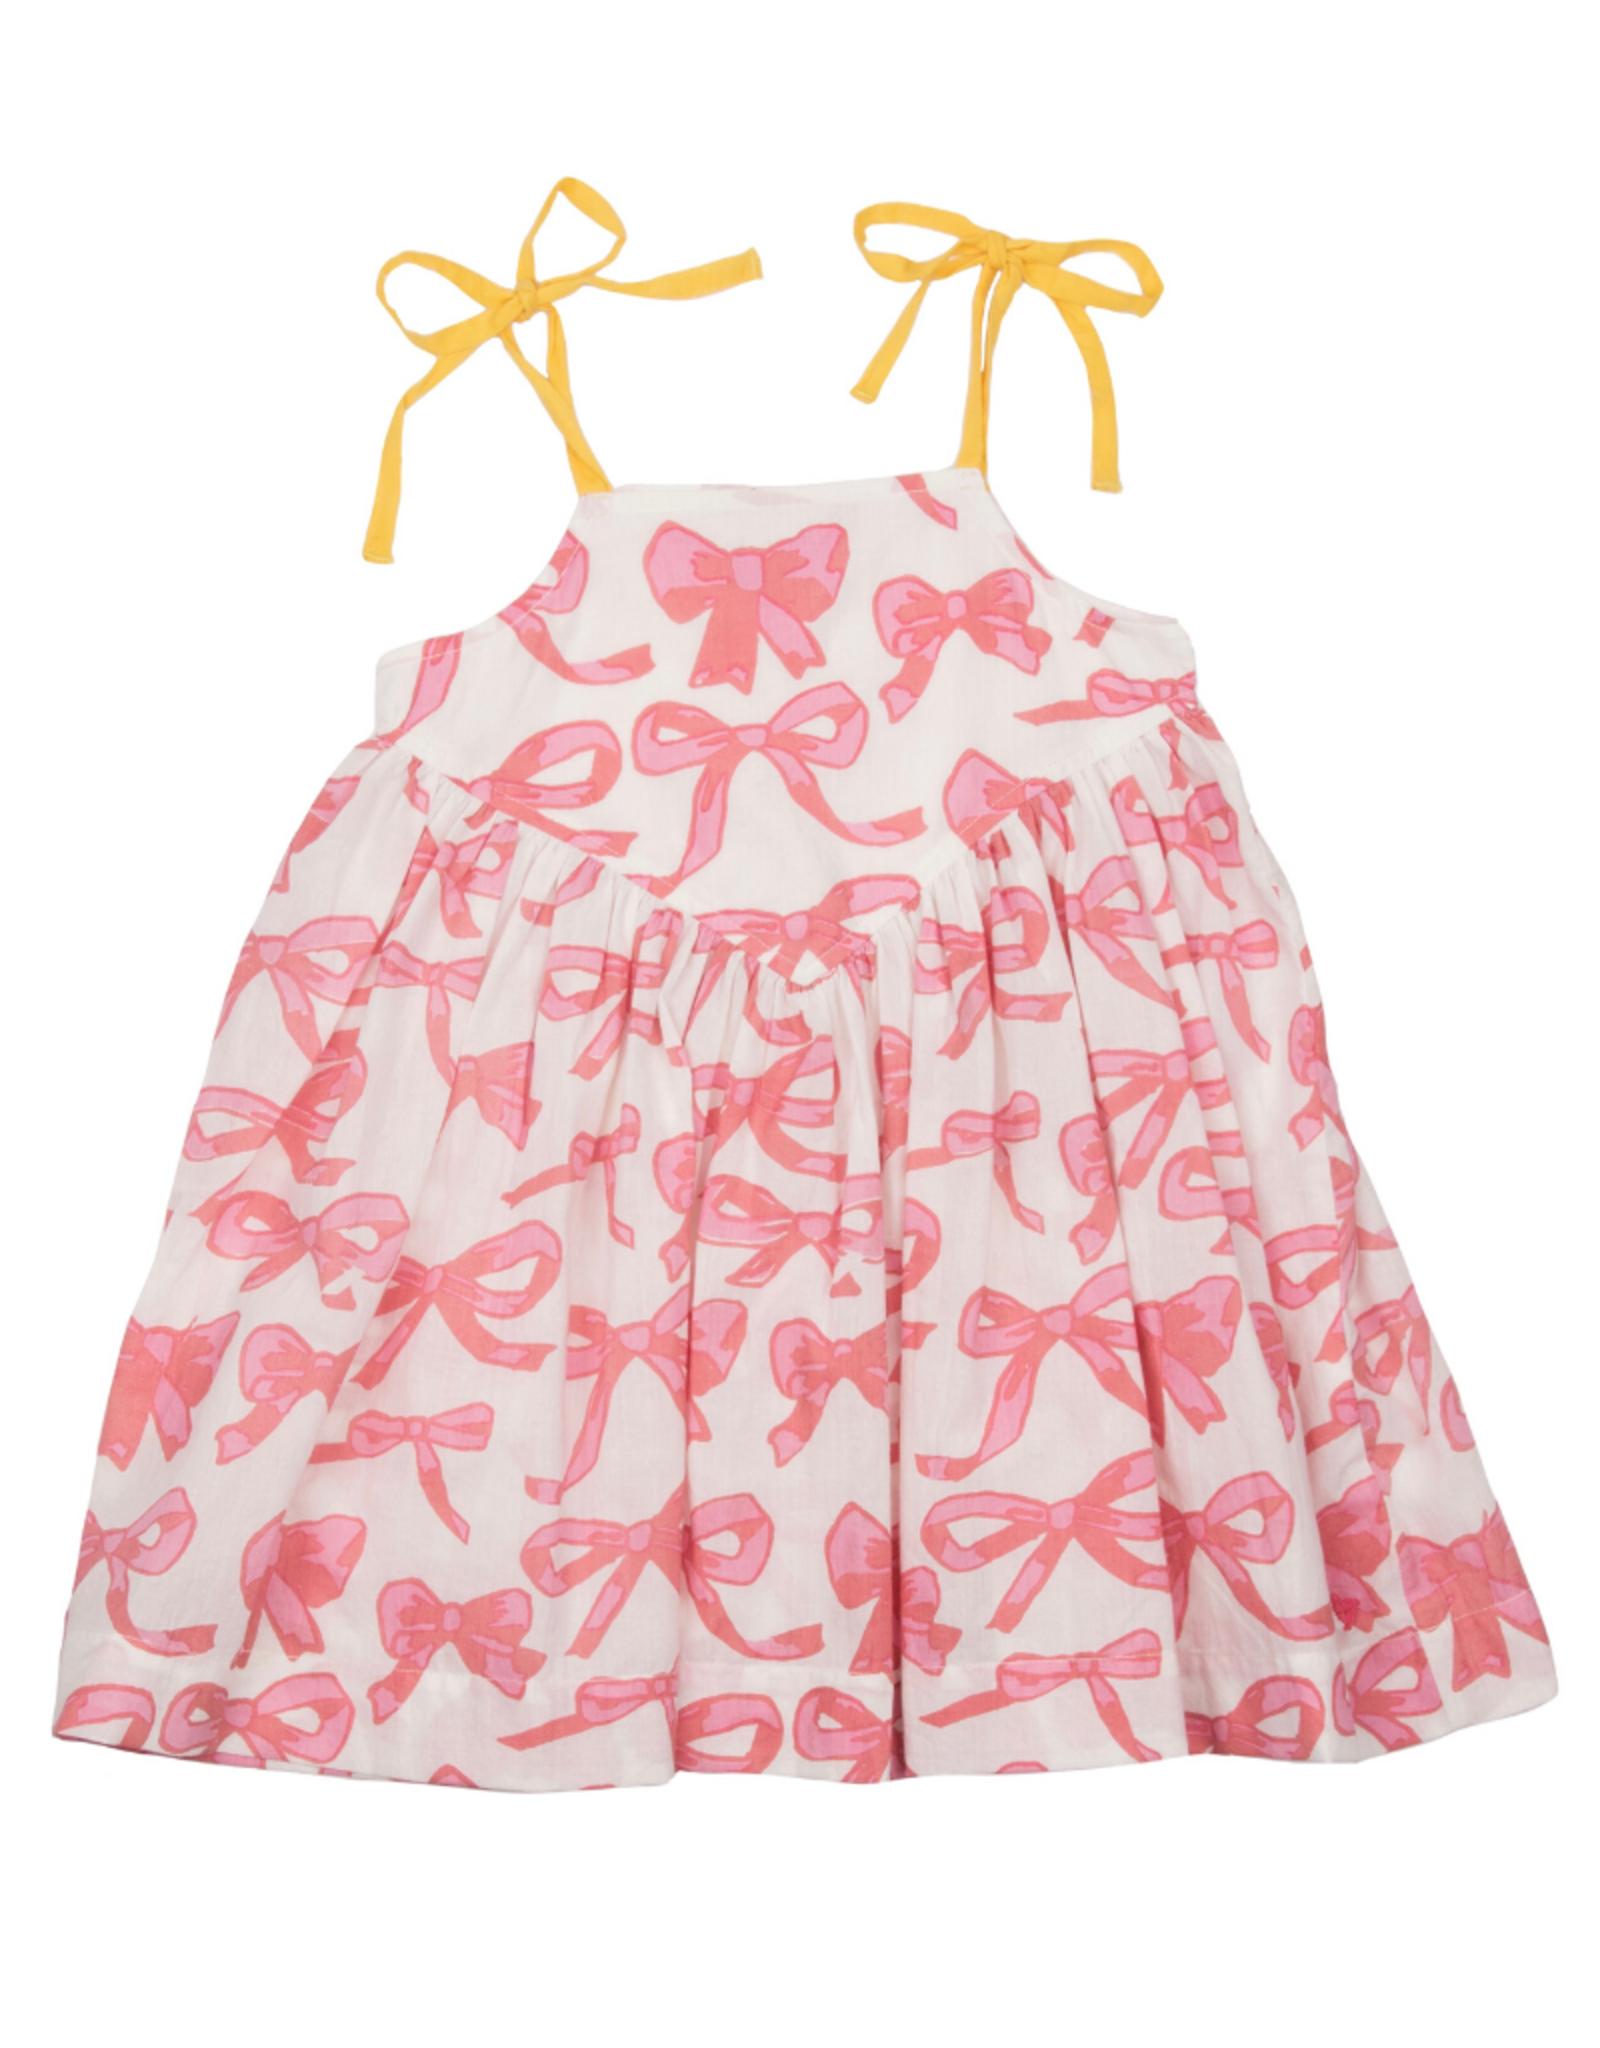 Pink Chicken Monroe Mauveglow Bow Dress